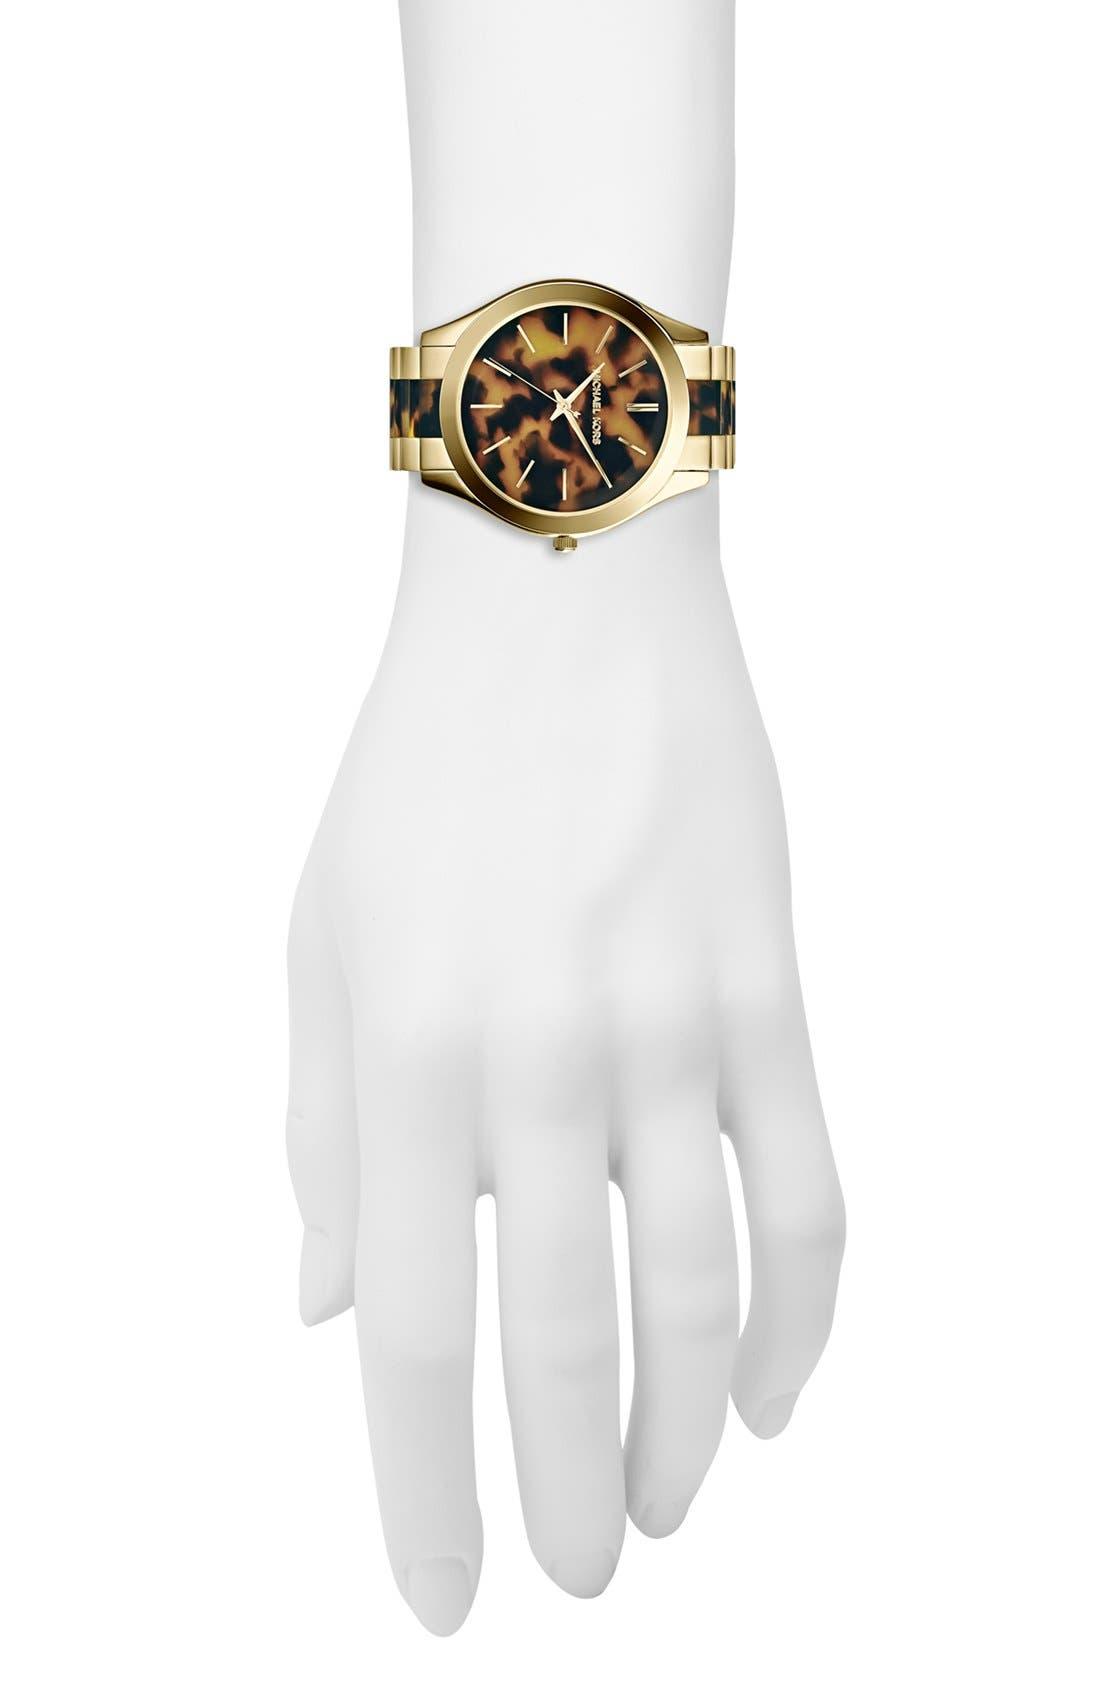 Michael Kors 'Slim Runway' Round Bracelet Watch, 42mm,                             Alternate thumbnail 5, color,                             200